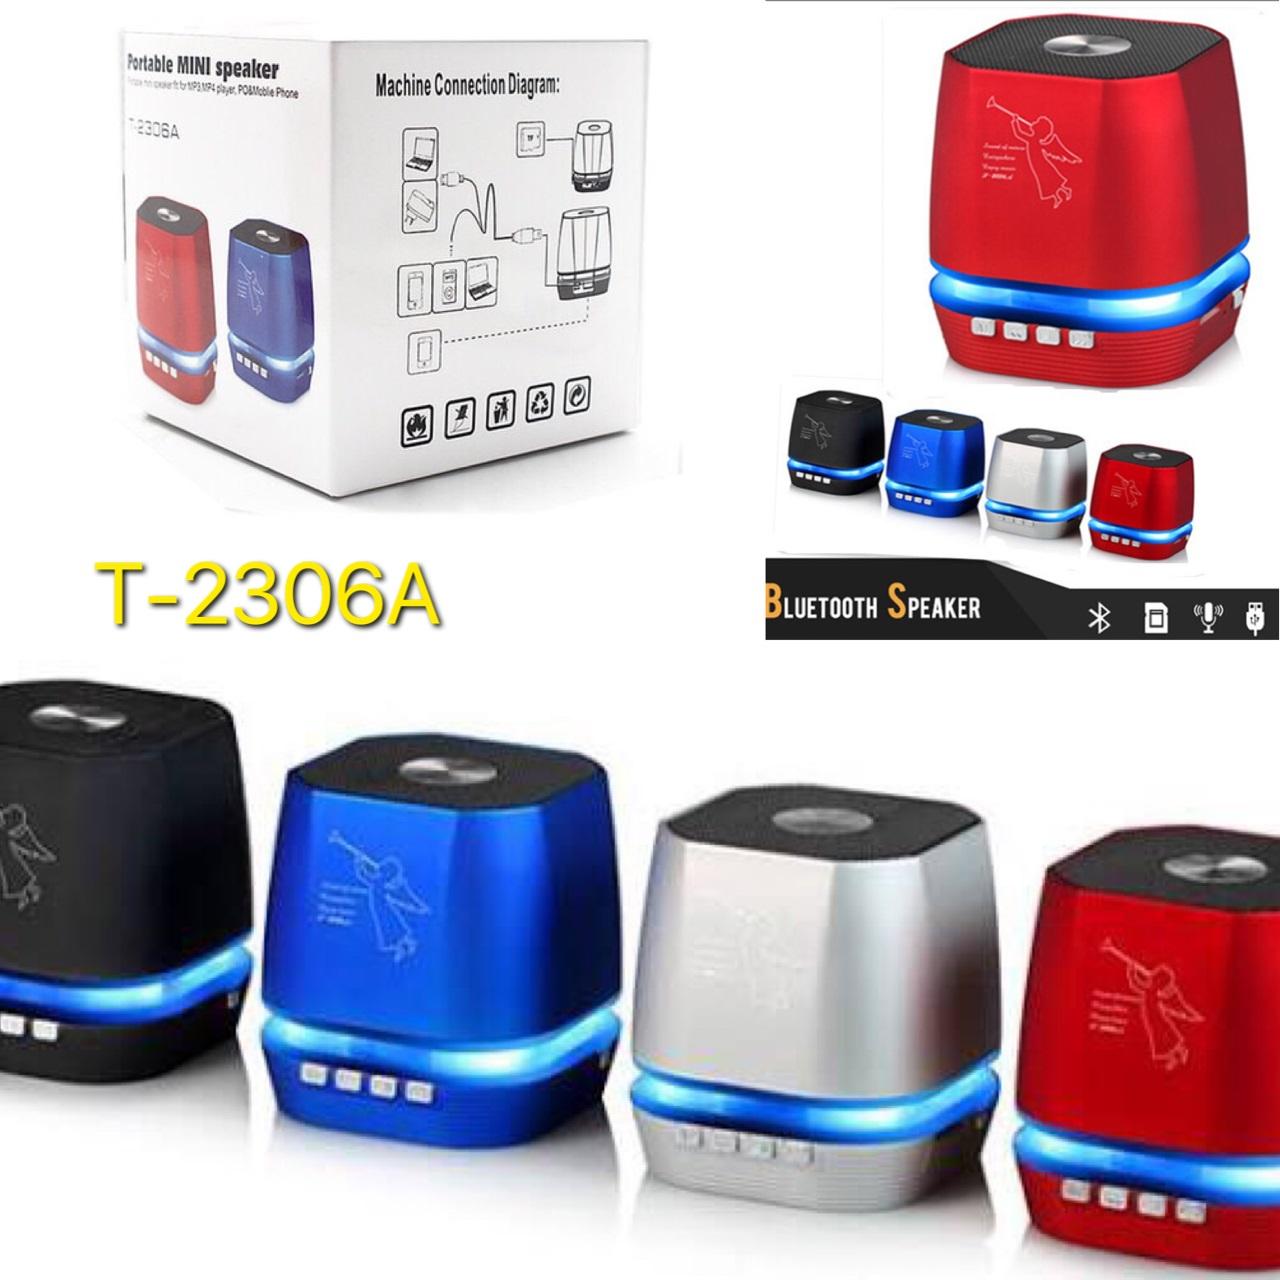 loa-nghe-nhac-bluetooth-t-2306a-cao-cap